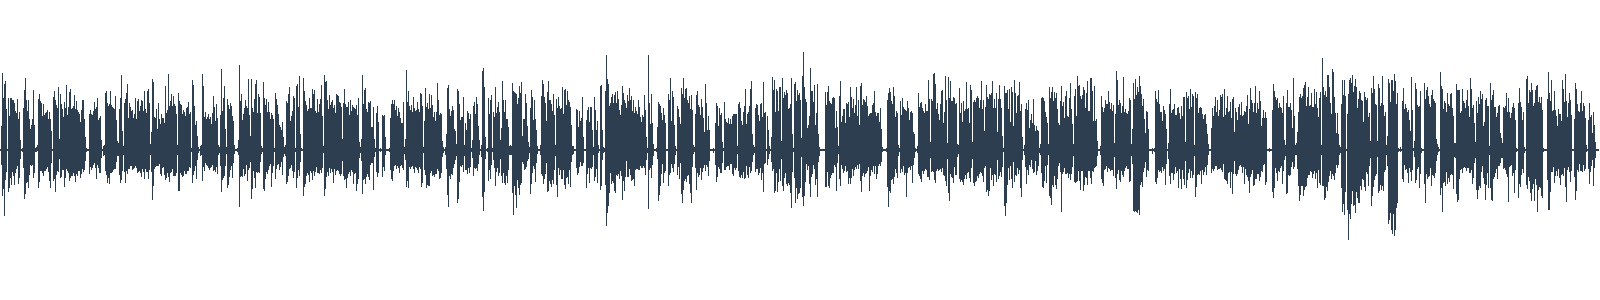 Spoveď Márie Antoinetty waveform